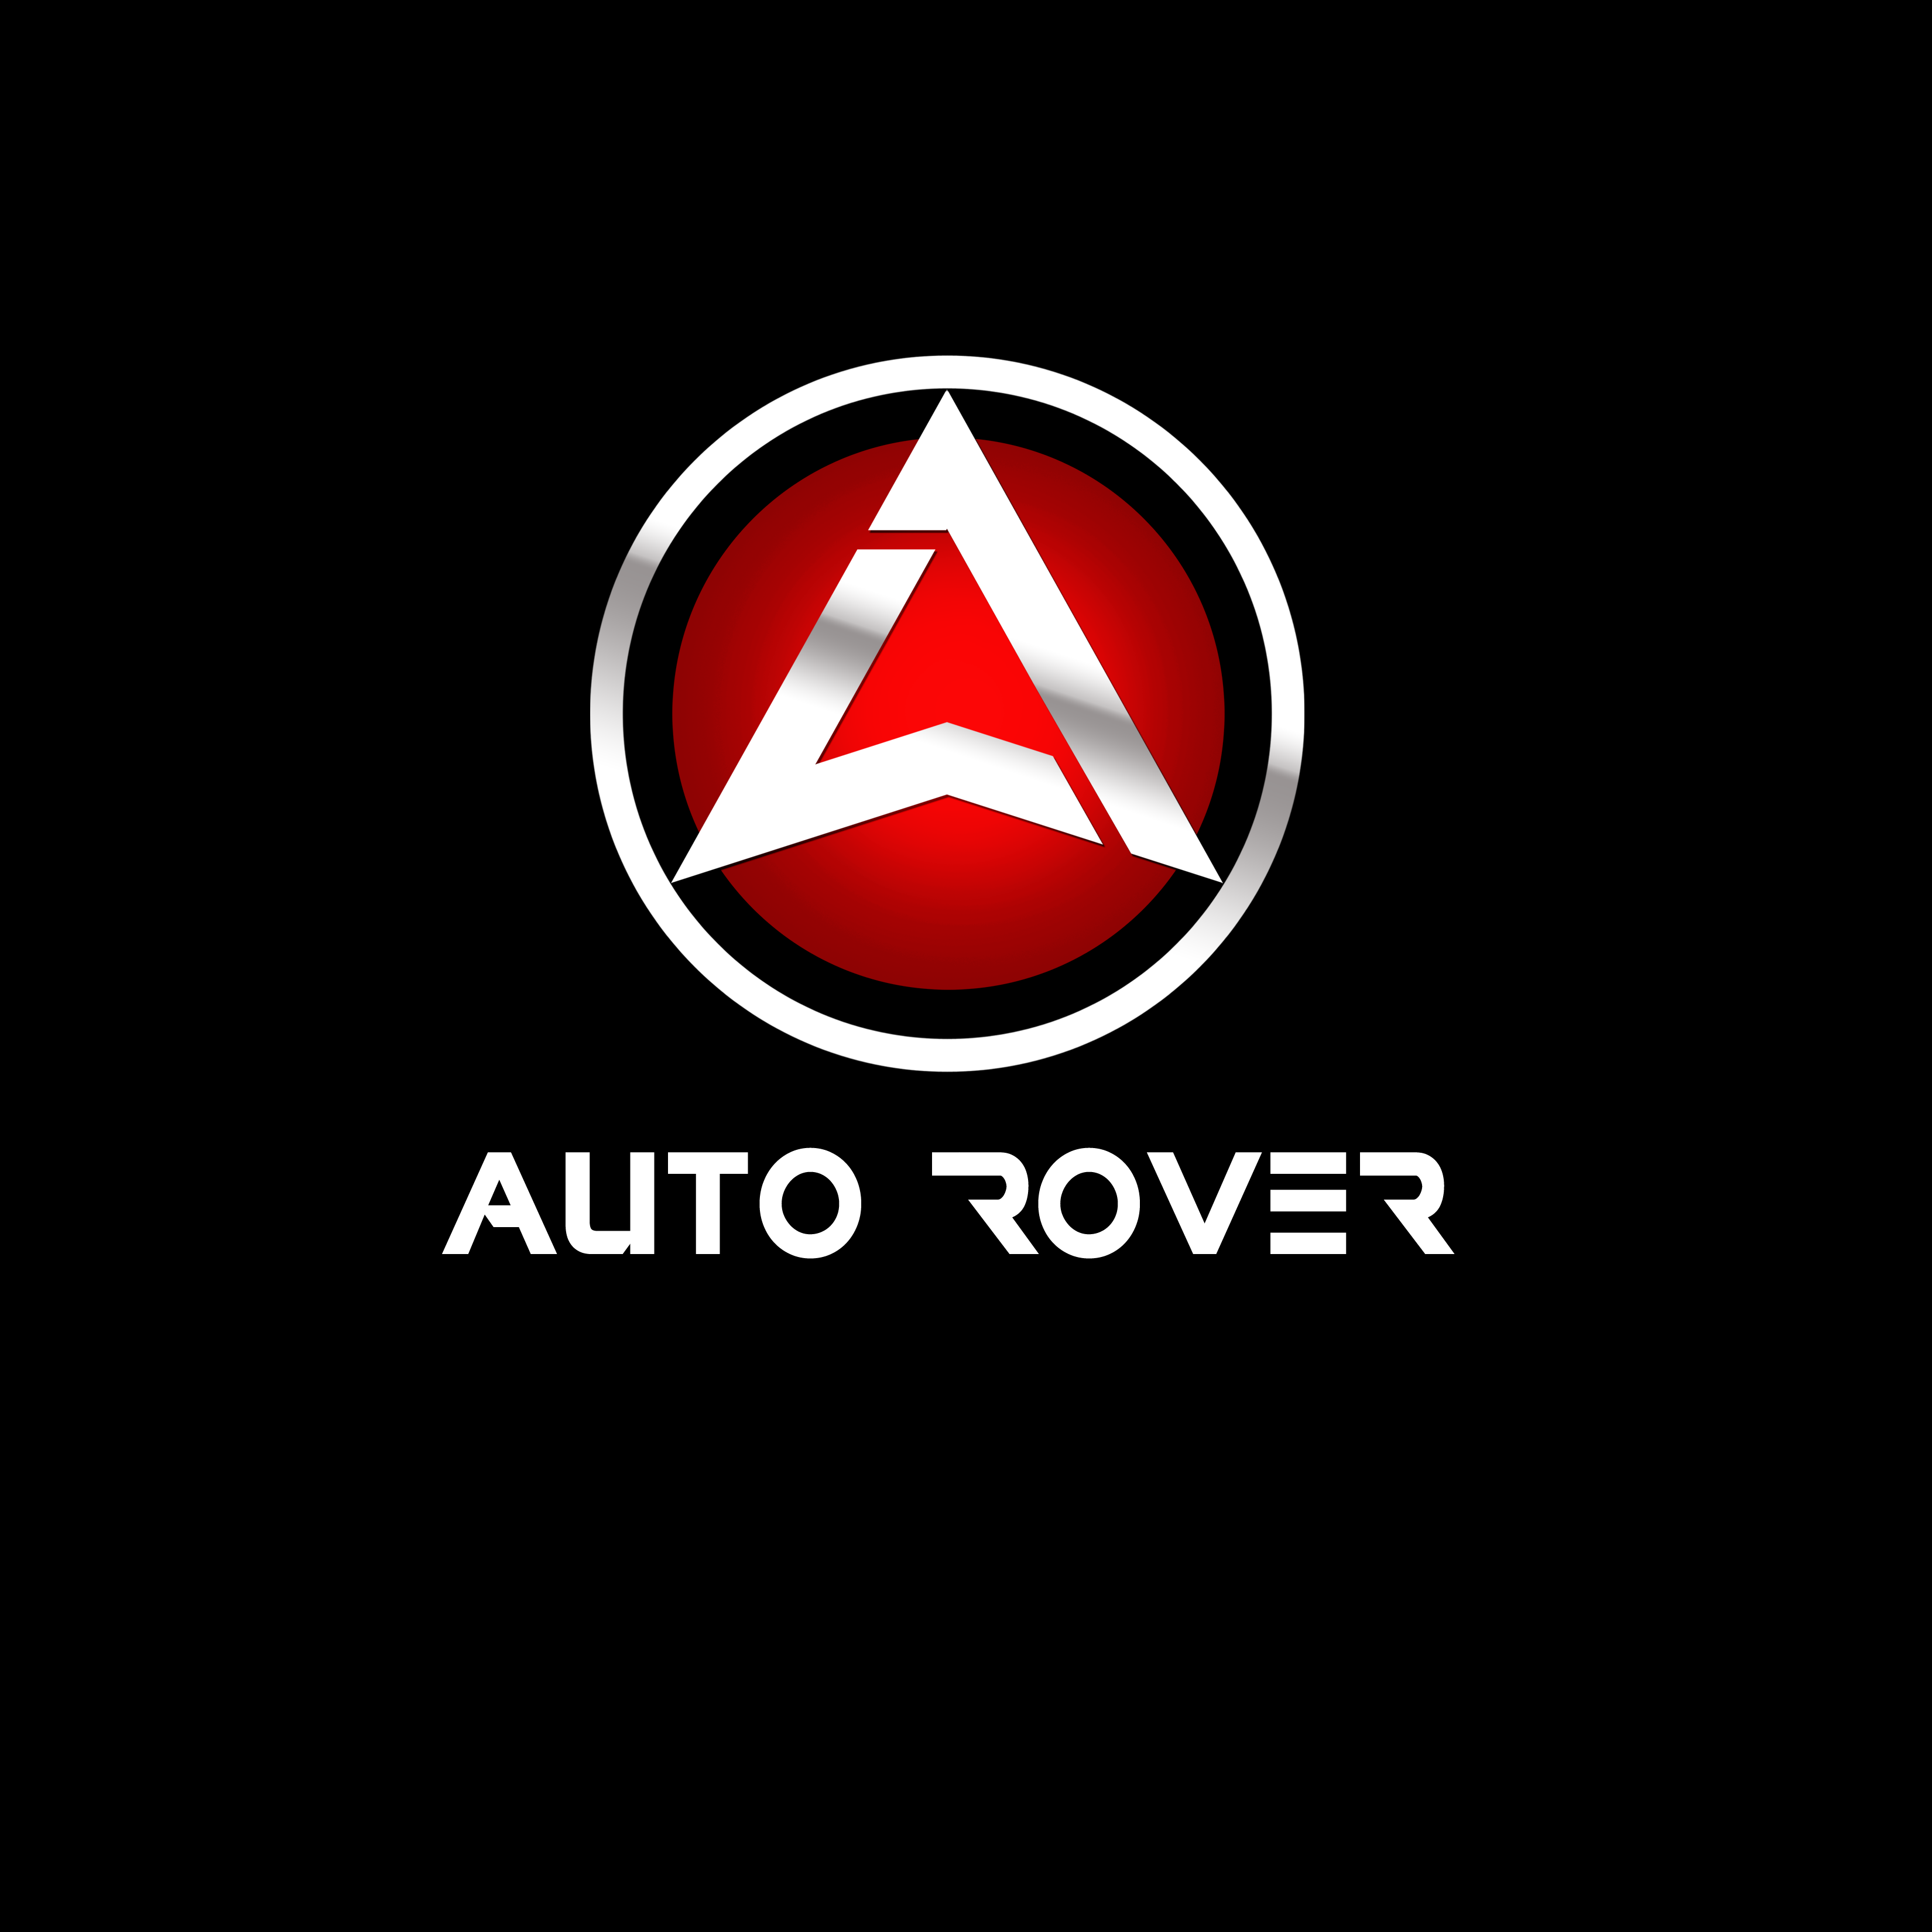 Logo Design by Allan Esclamado - Entry No. 12 in the Logo Design Contest Auto Rover Logo Design.